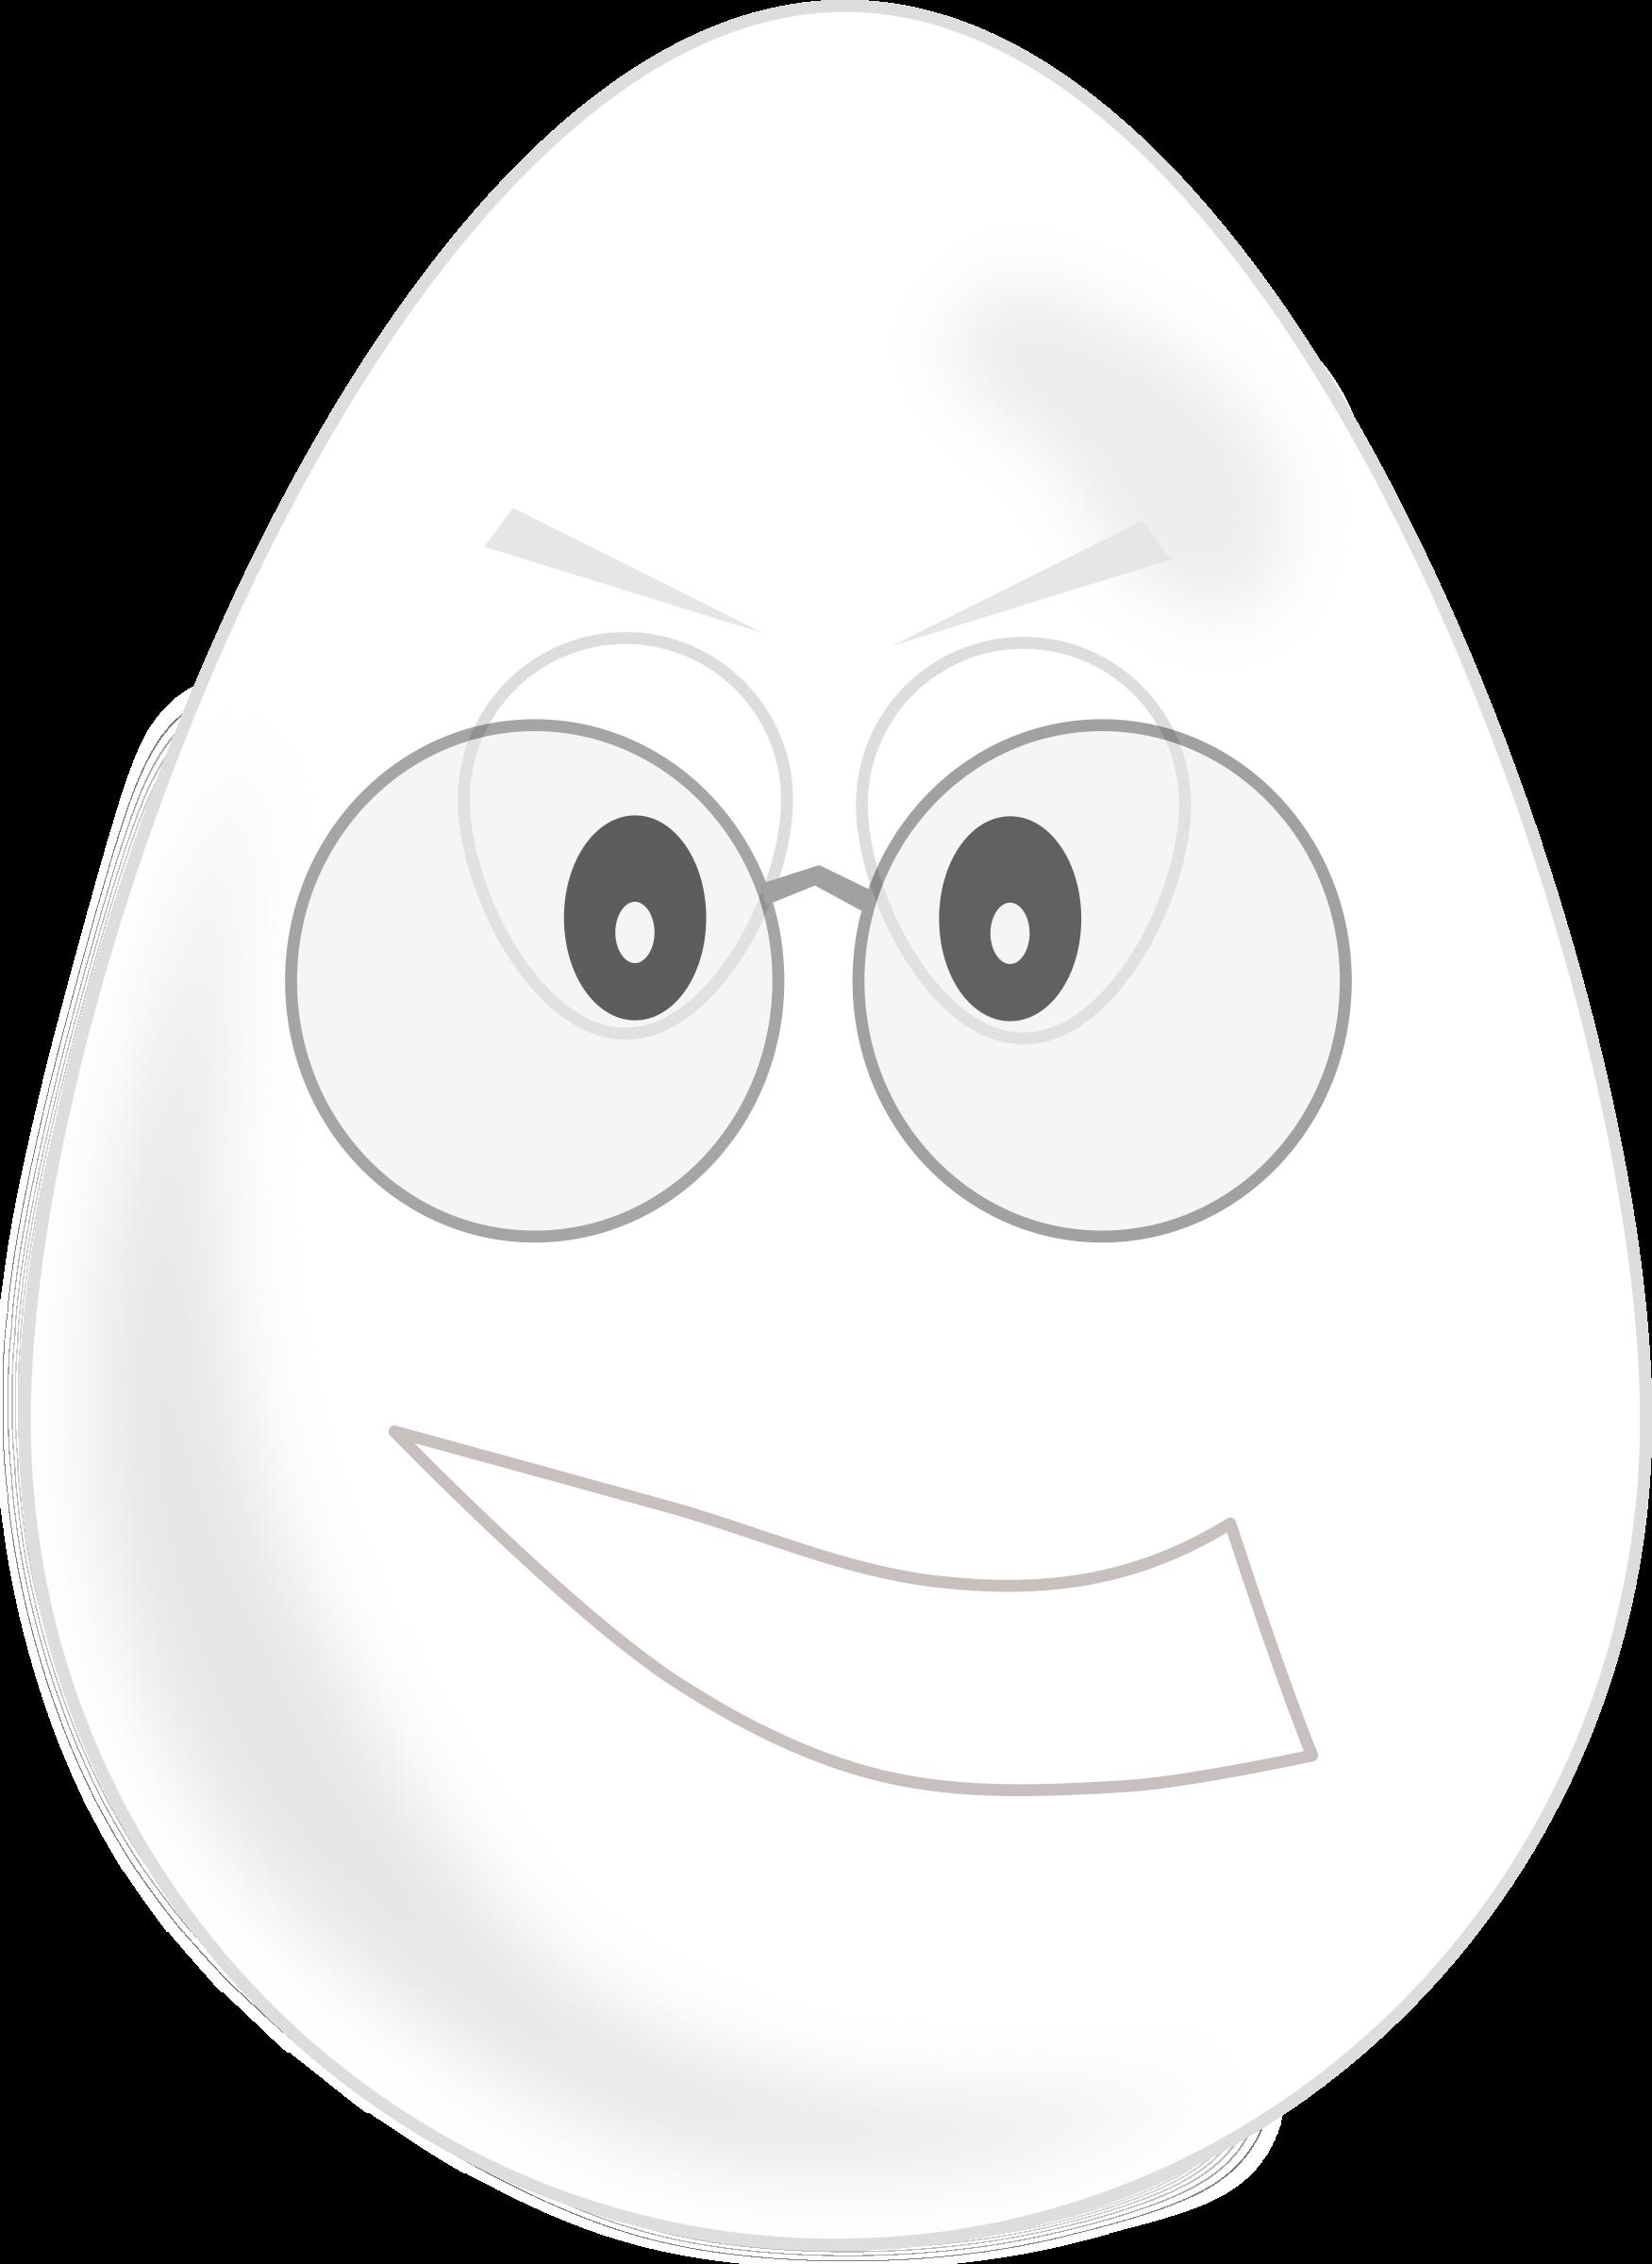 Wear glasses big image. Egg clipart face